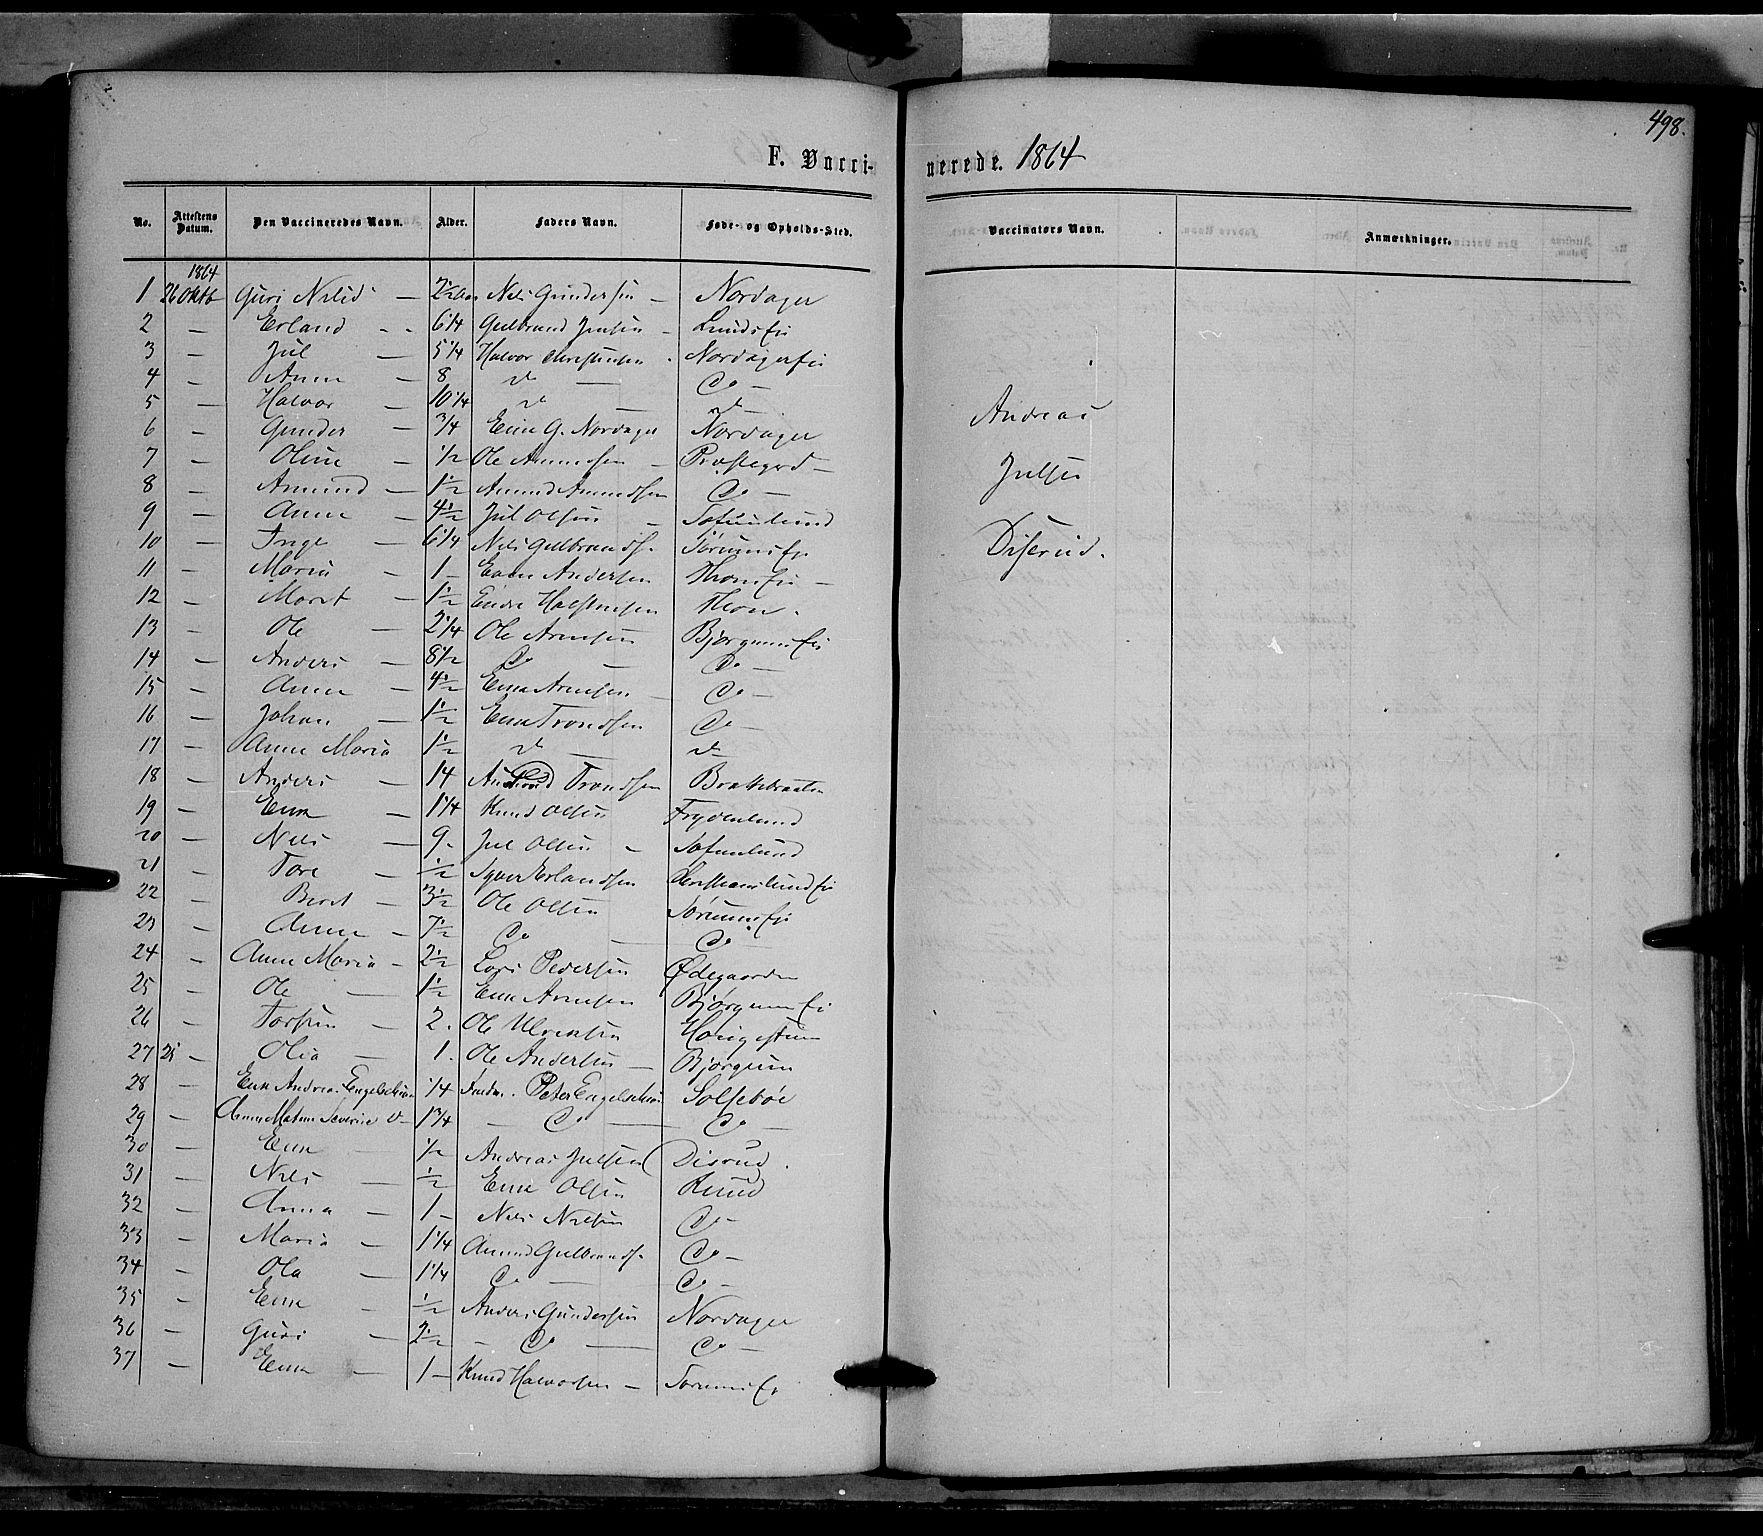 SAH, Nord-Aurdal prestekontor, Ministerialbok nr. 8, 1863-1875, s. 498